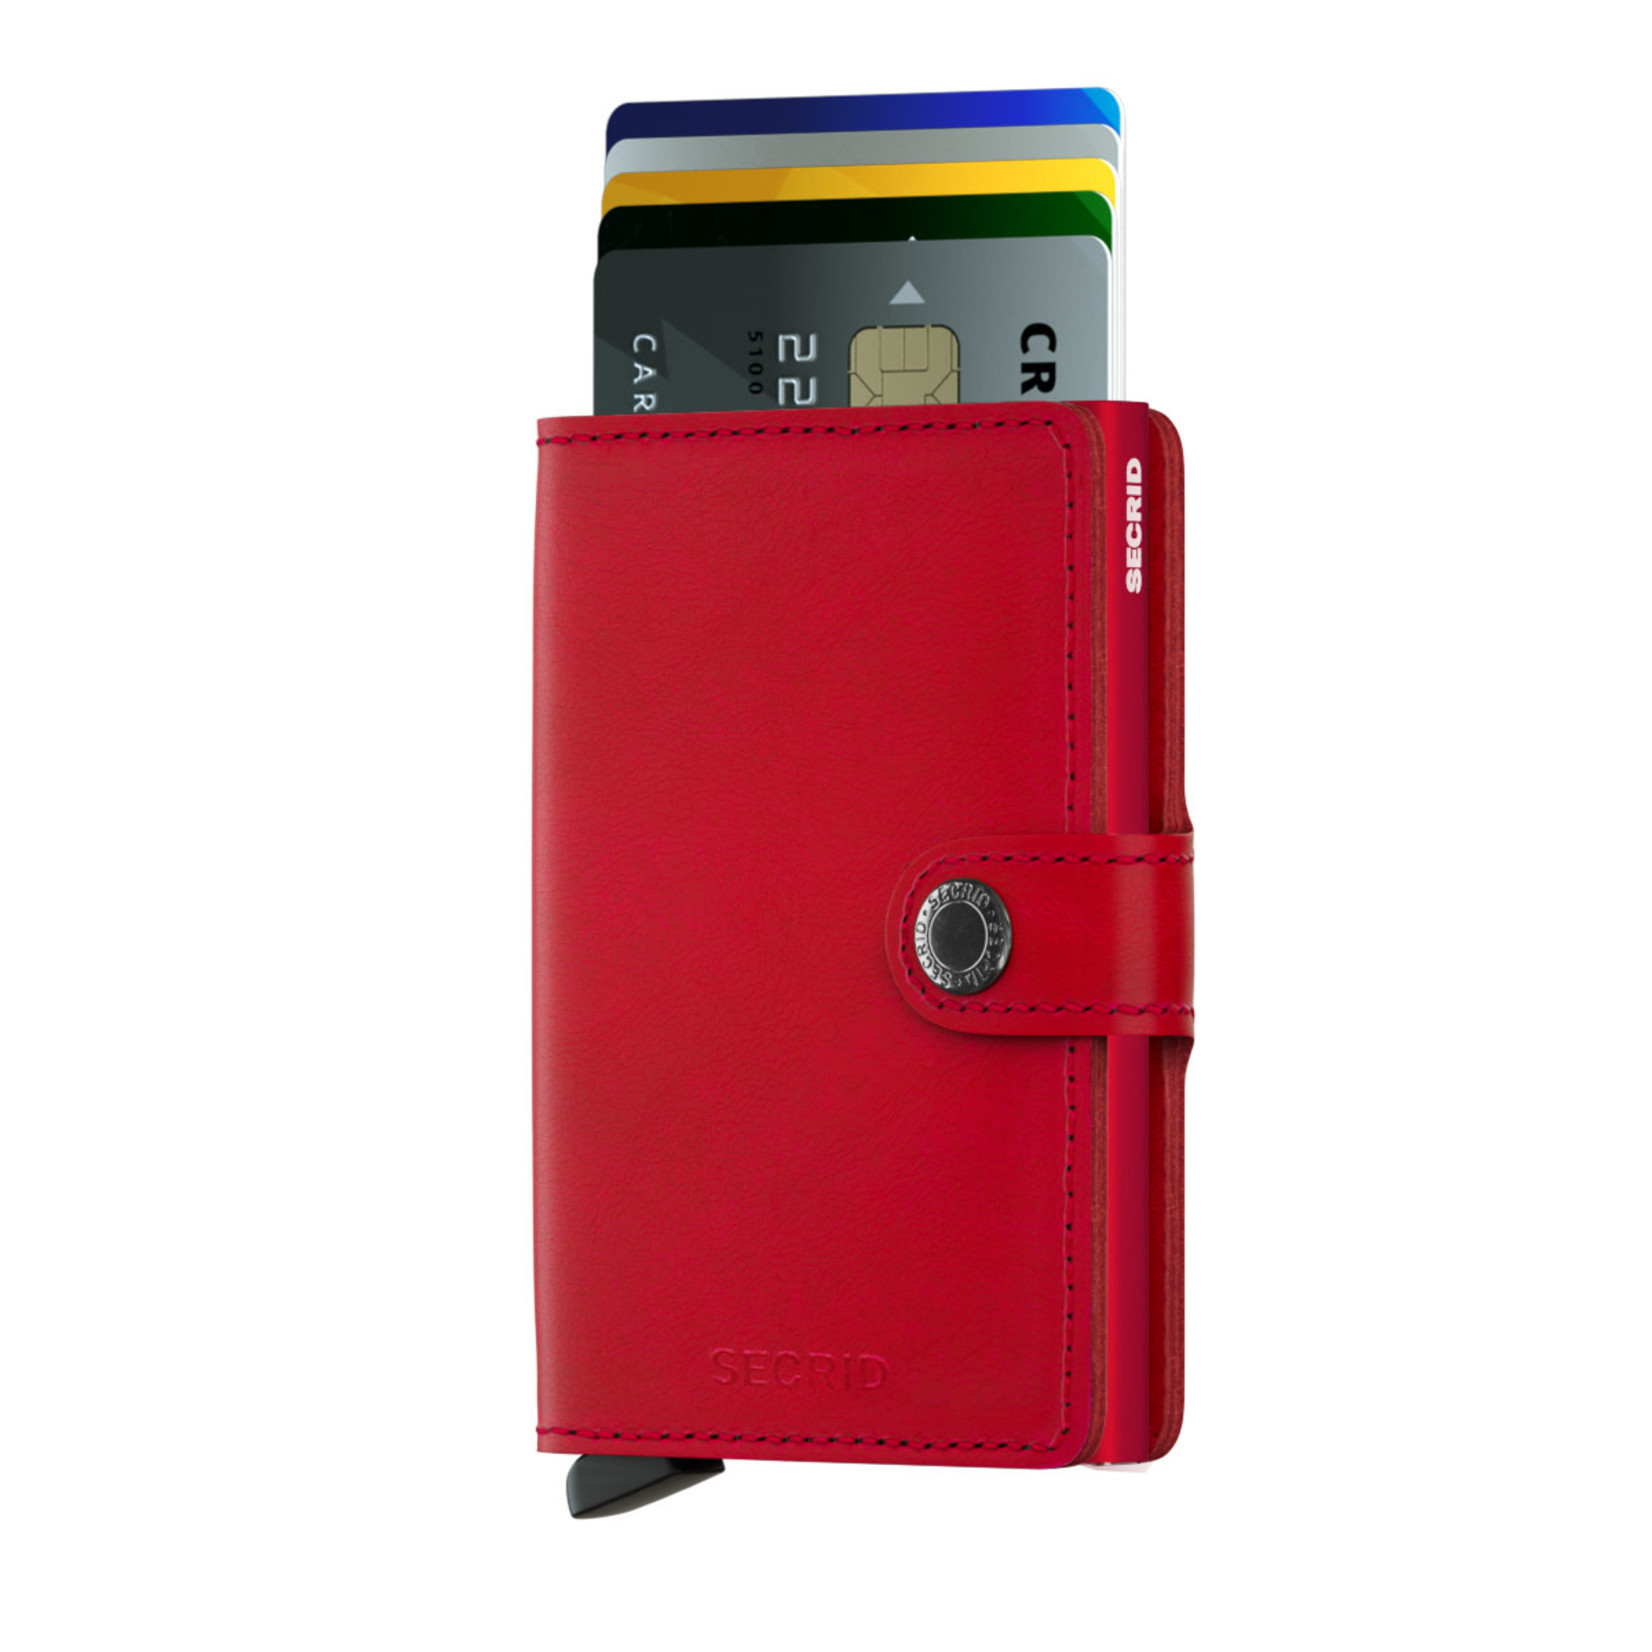 SECRID Miniwallet Original Red / Red